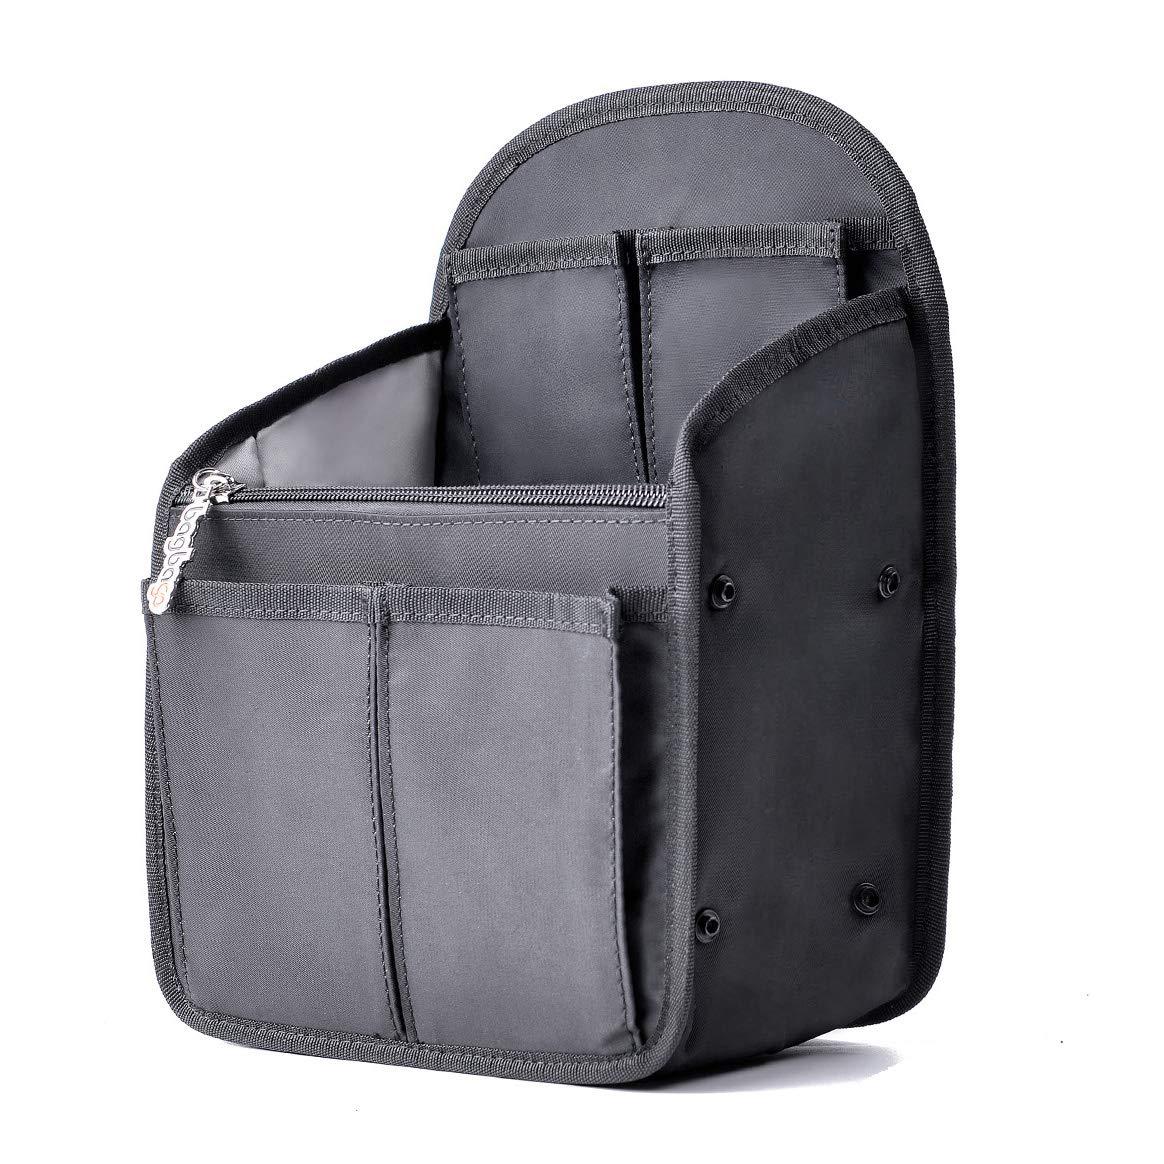 32684fc8dd21 Backpack Organizer bag in bag Shoulders Bag Rucksack Insert fit Mini ...